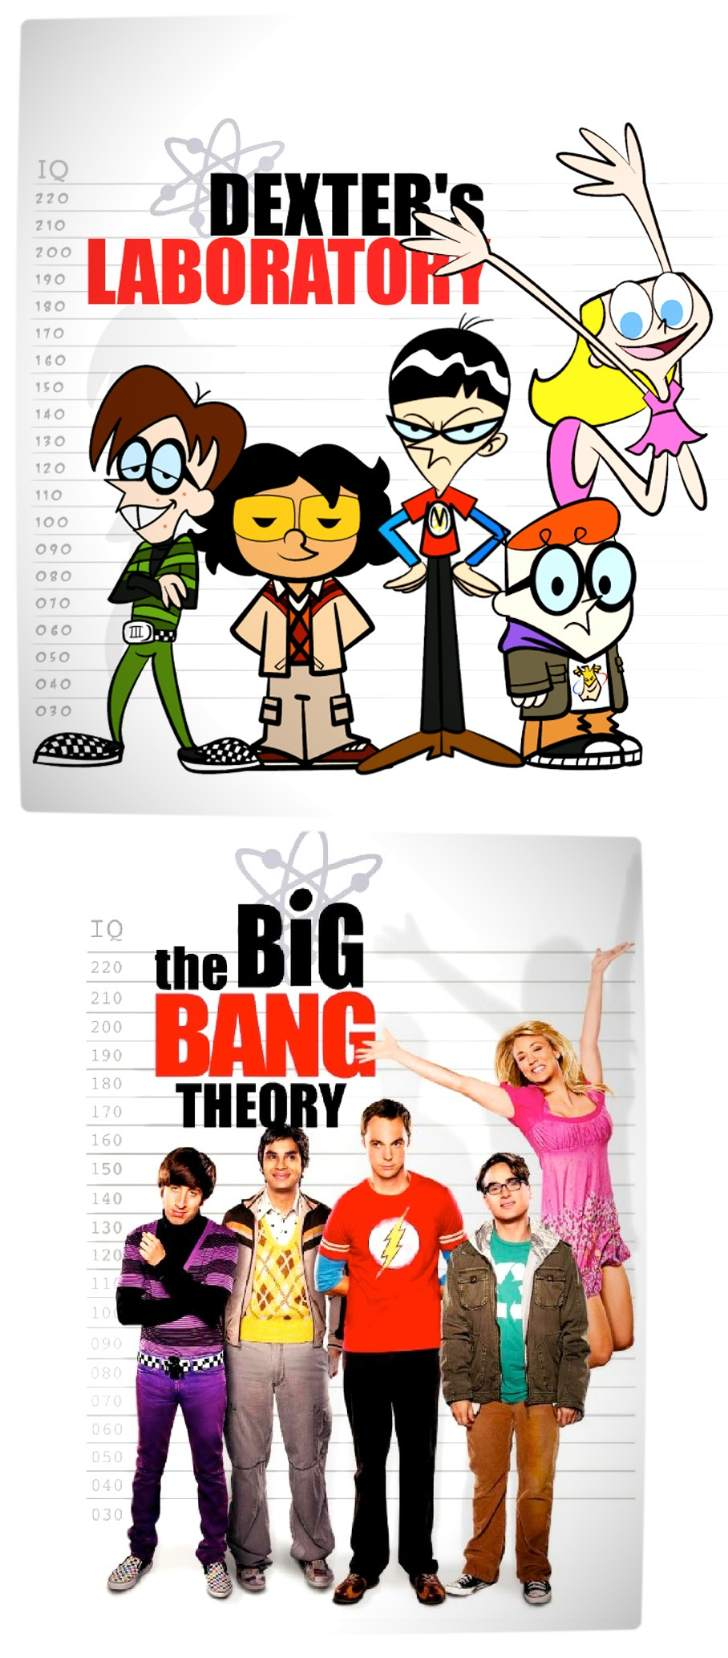 dexter u0027s laboratory vs the big bang theory 9buz